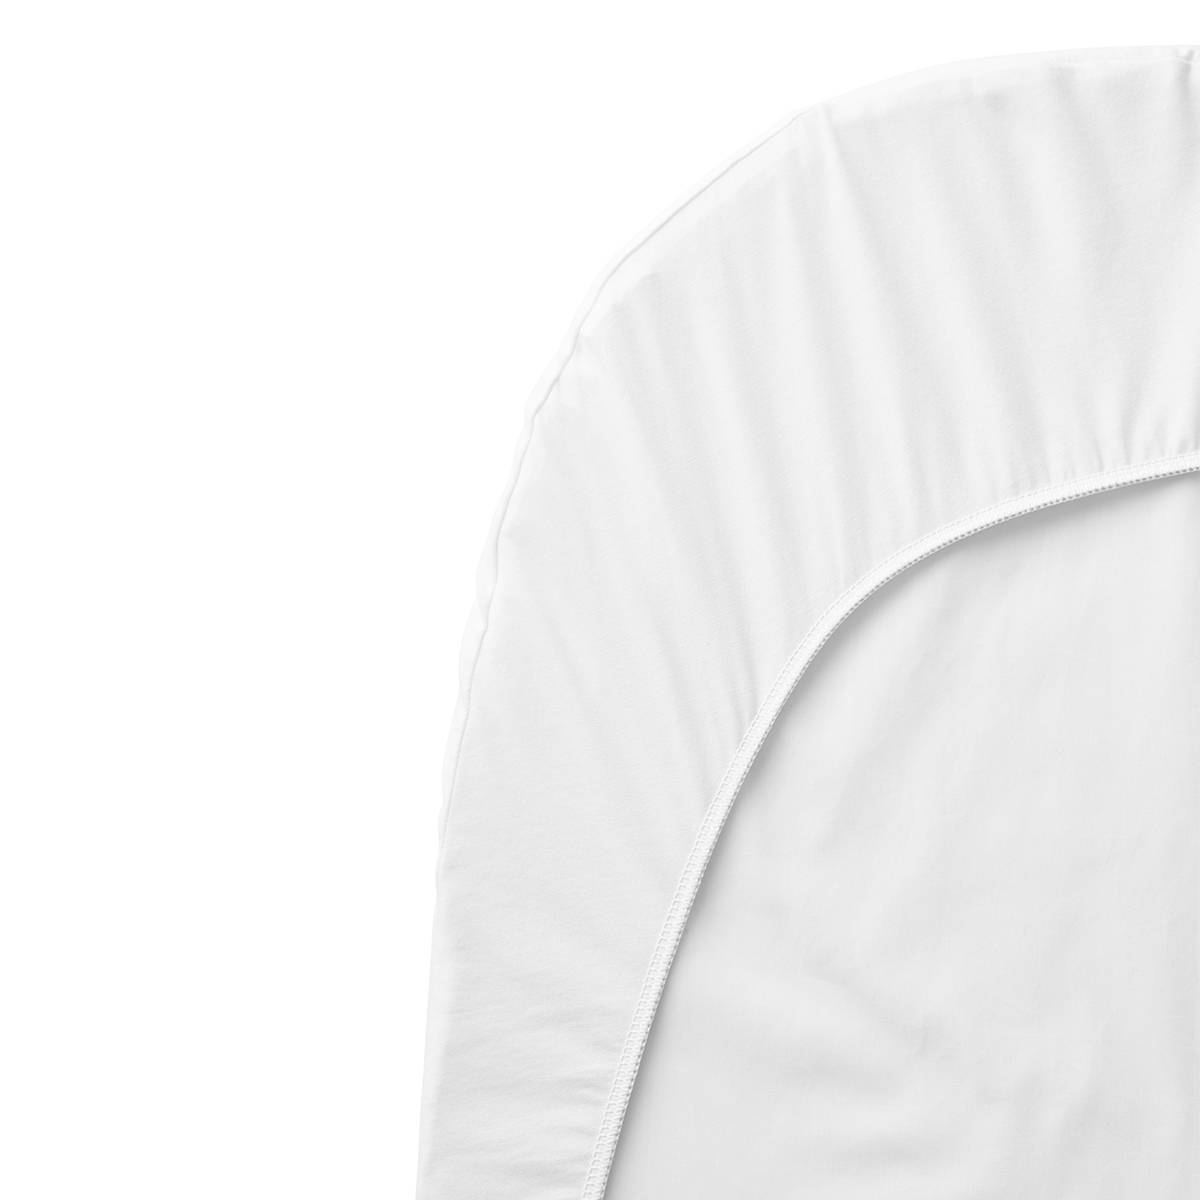 BabyBjörn Drap Housse Berceau Evolutif Blanc - 54 x 104 cm